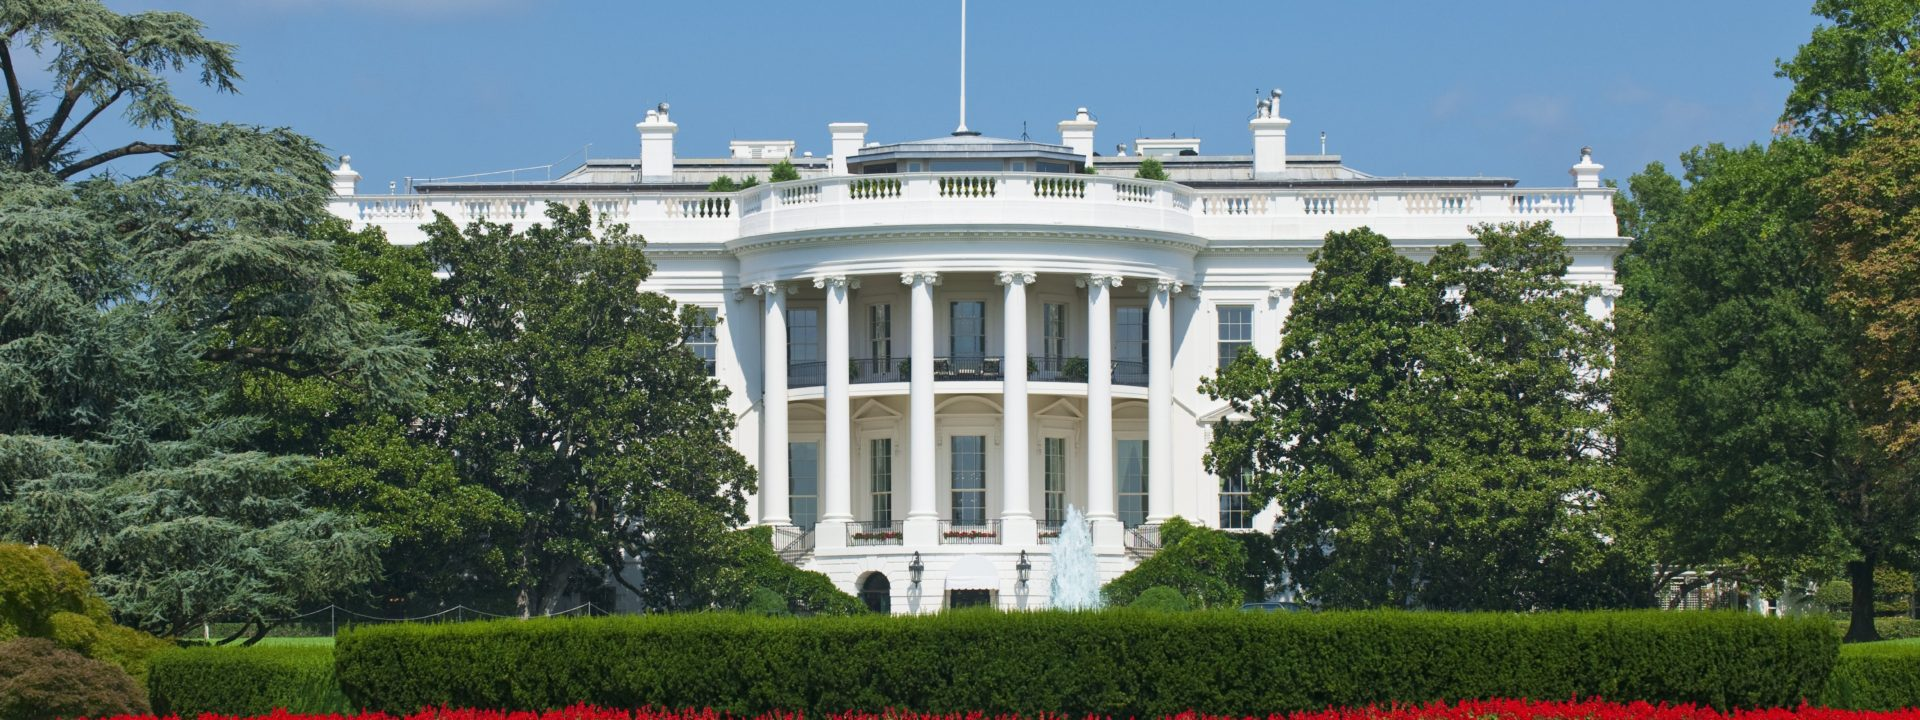 Белый дом, фото с сайта whitehouse.gov